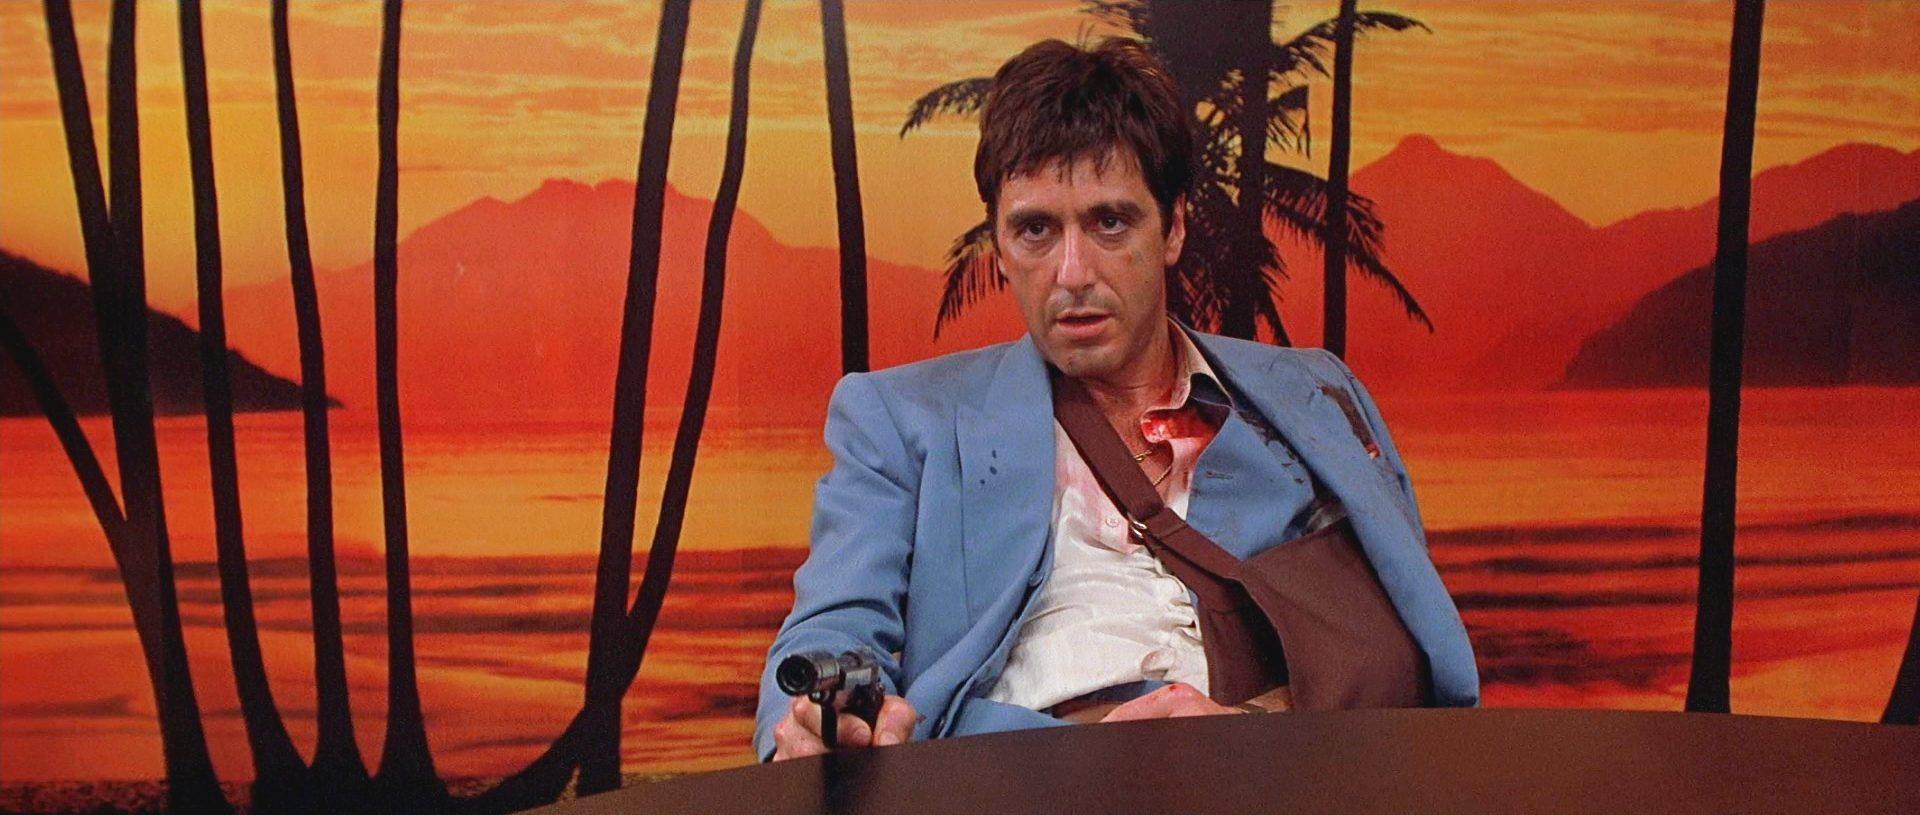 Filmszene aus Scarface (1983)